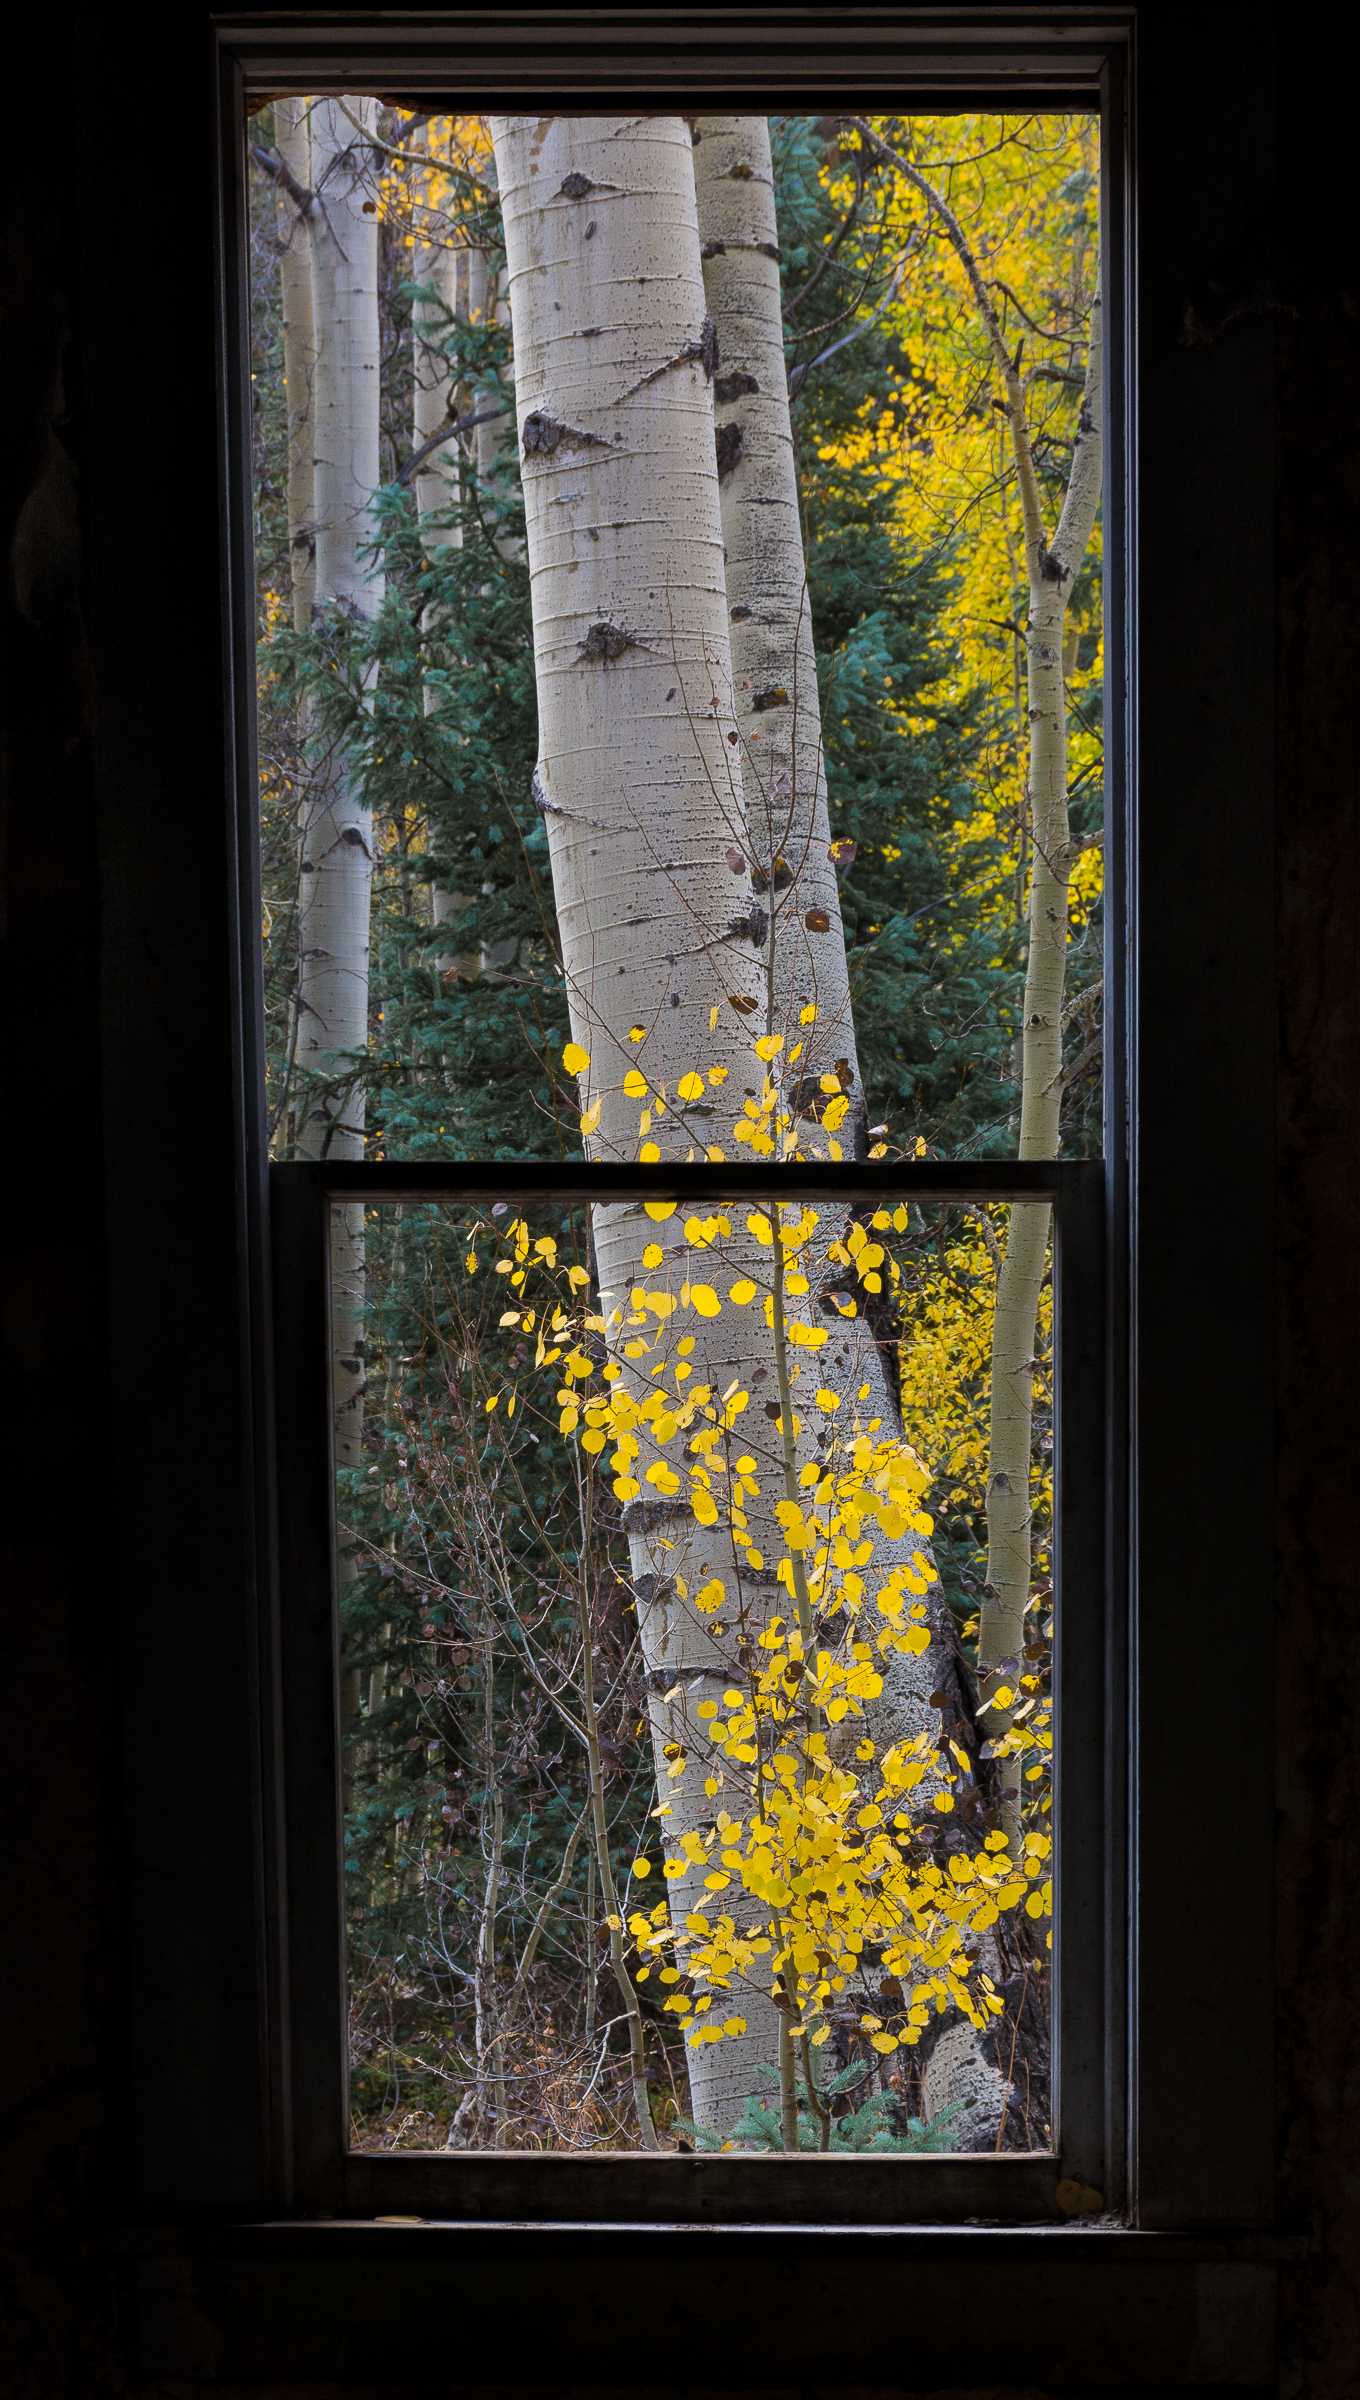 Through an Ironton Window